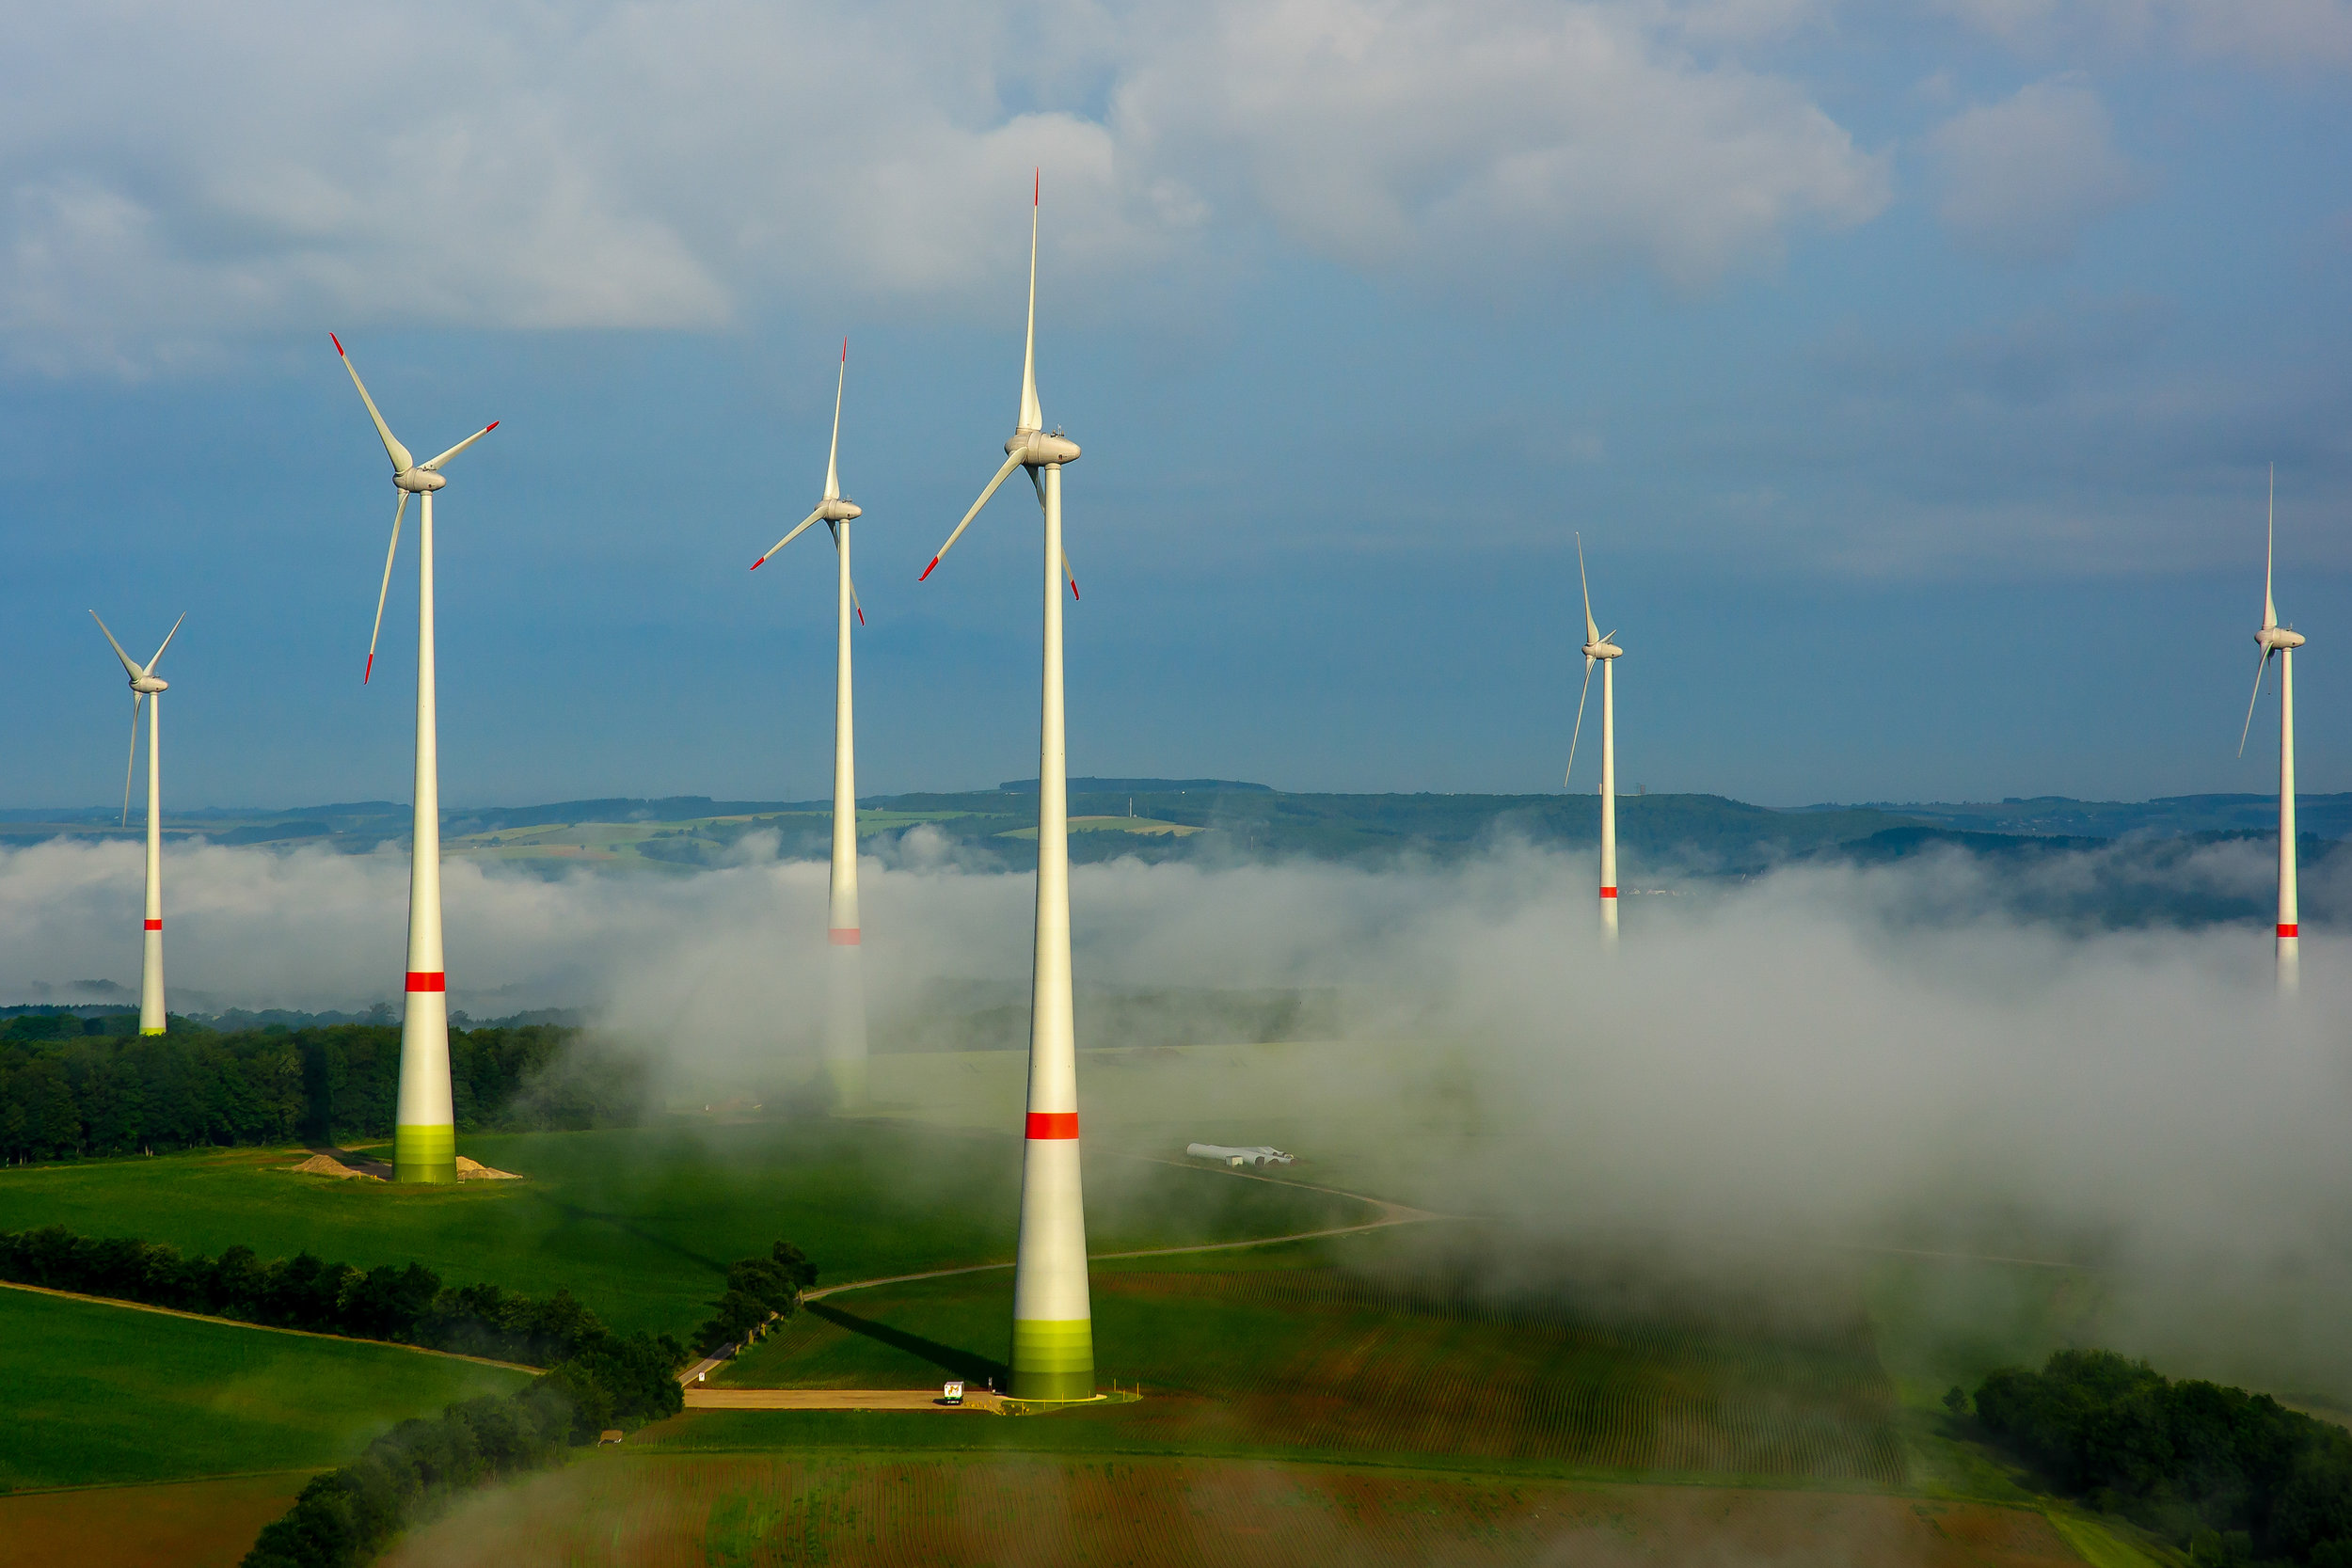 20120630-Windpark-2367_Special.jpg